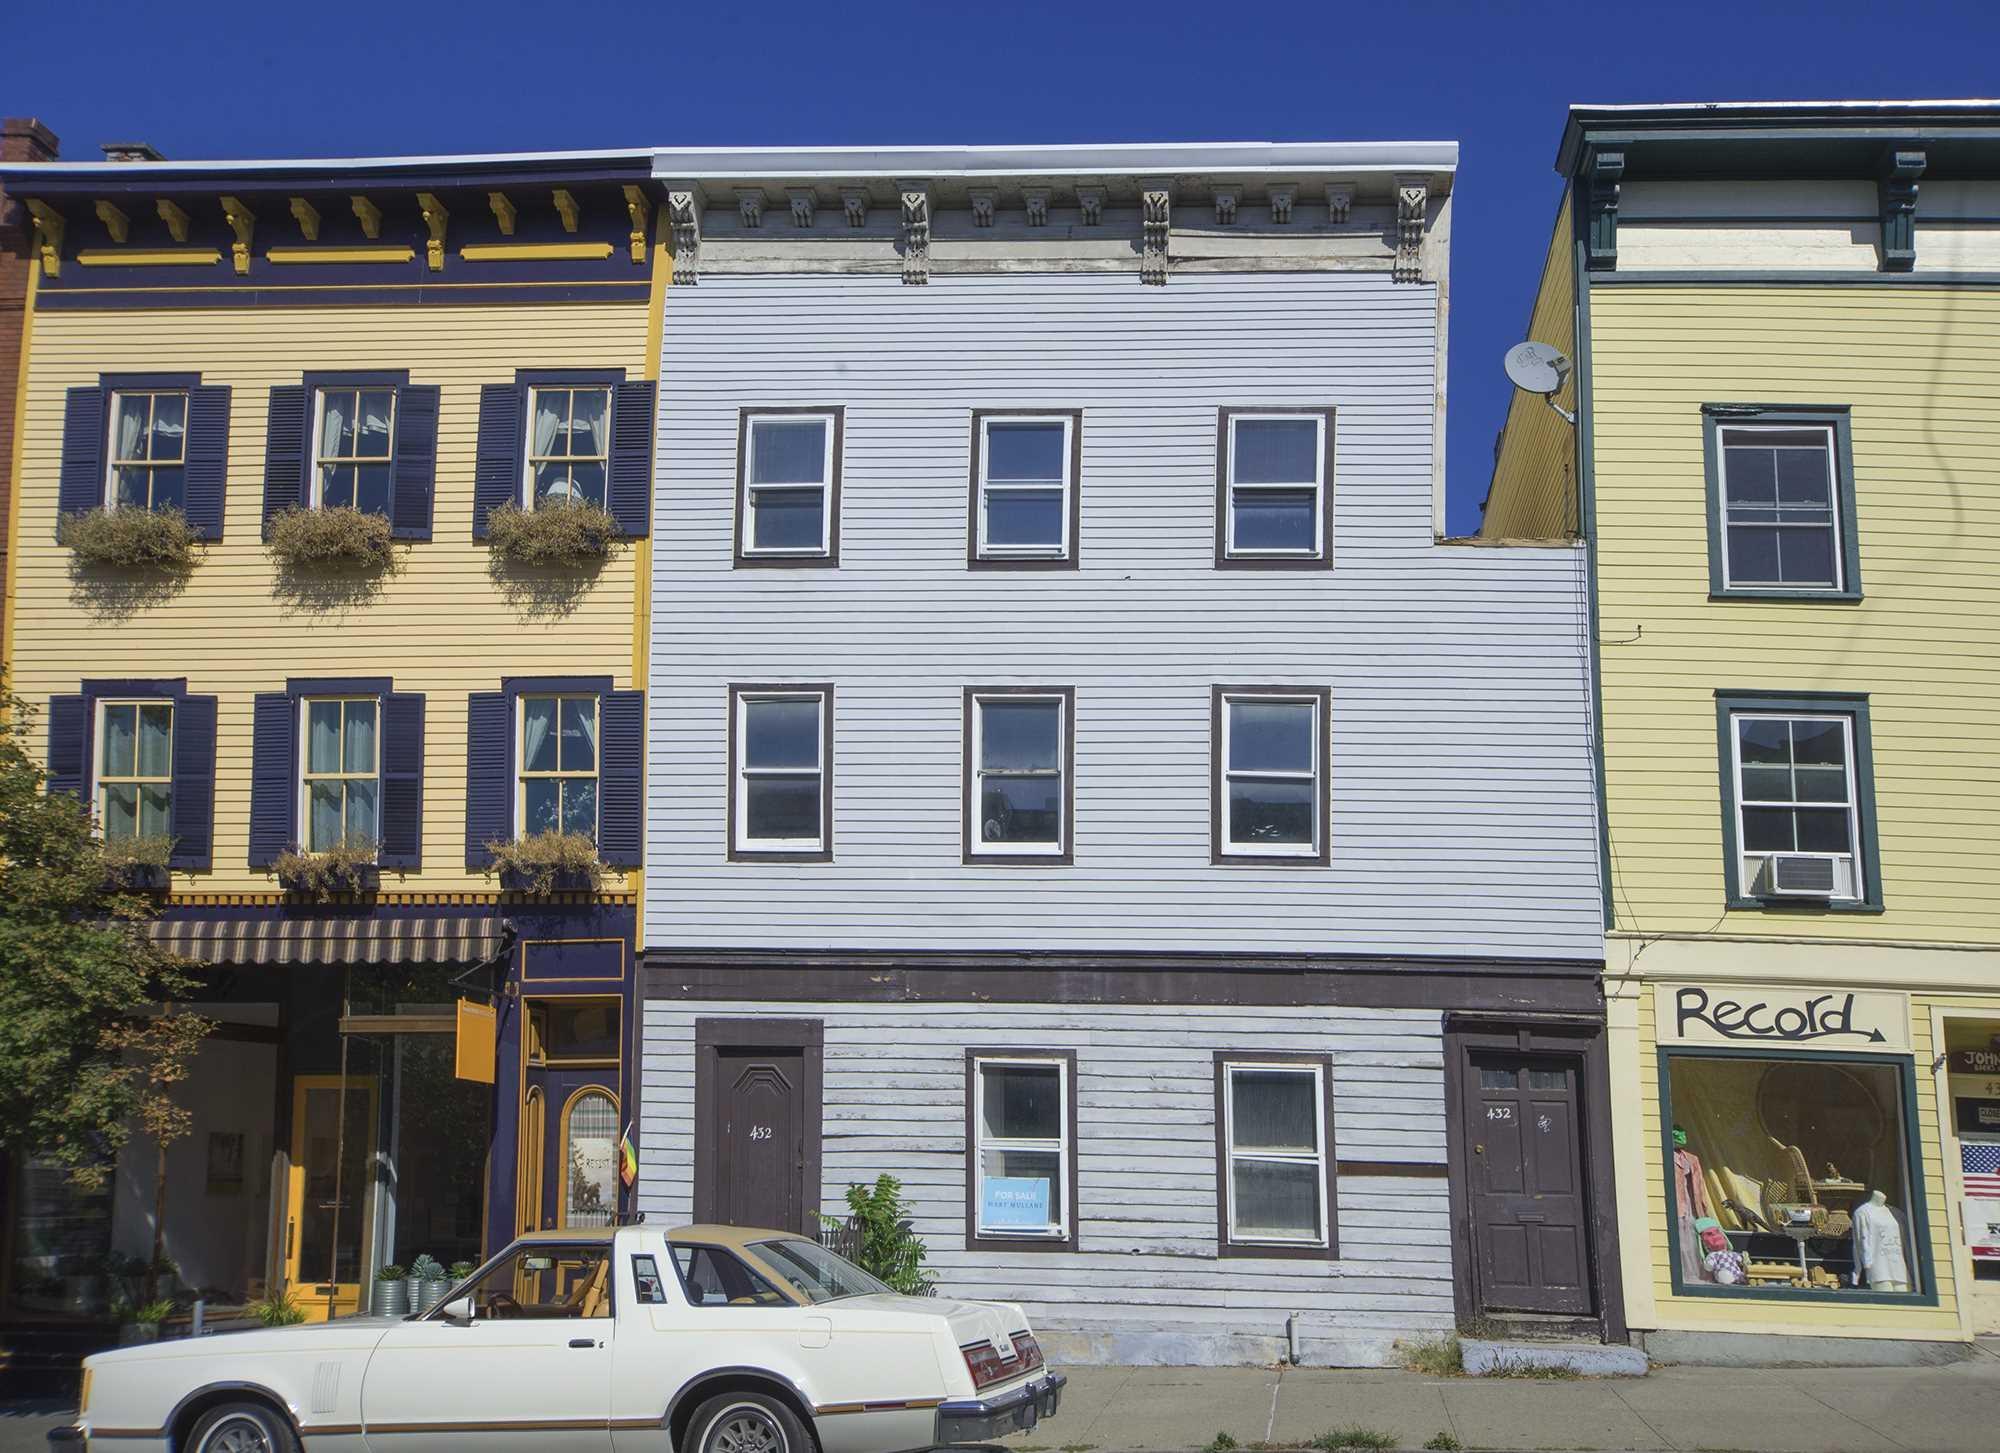 Single Family Home for Sale at 432 WARREN Street 432 WARREN Street Hudson, New York 12534 United States